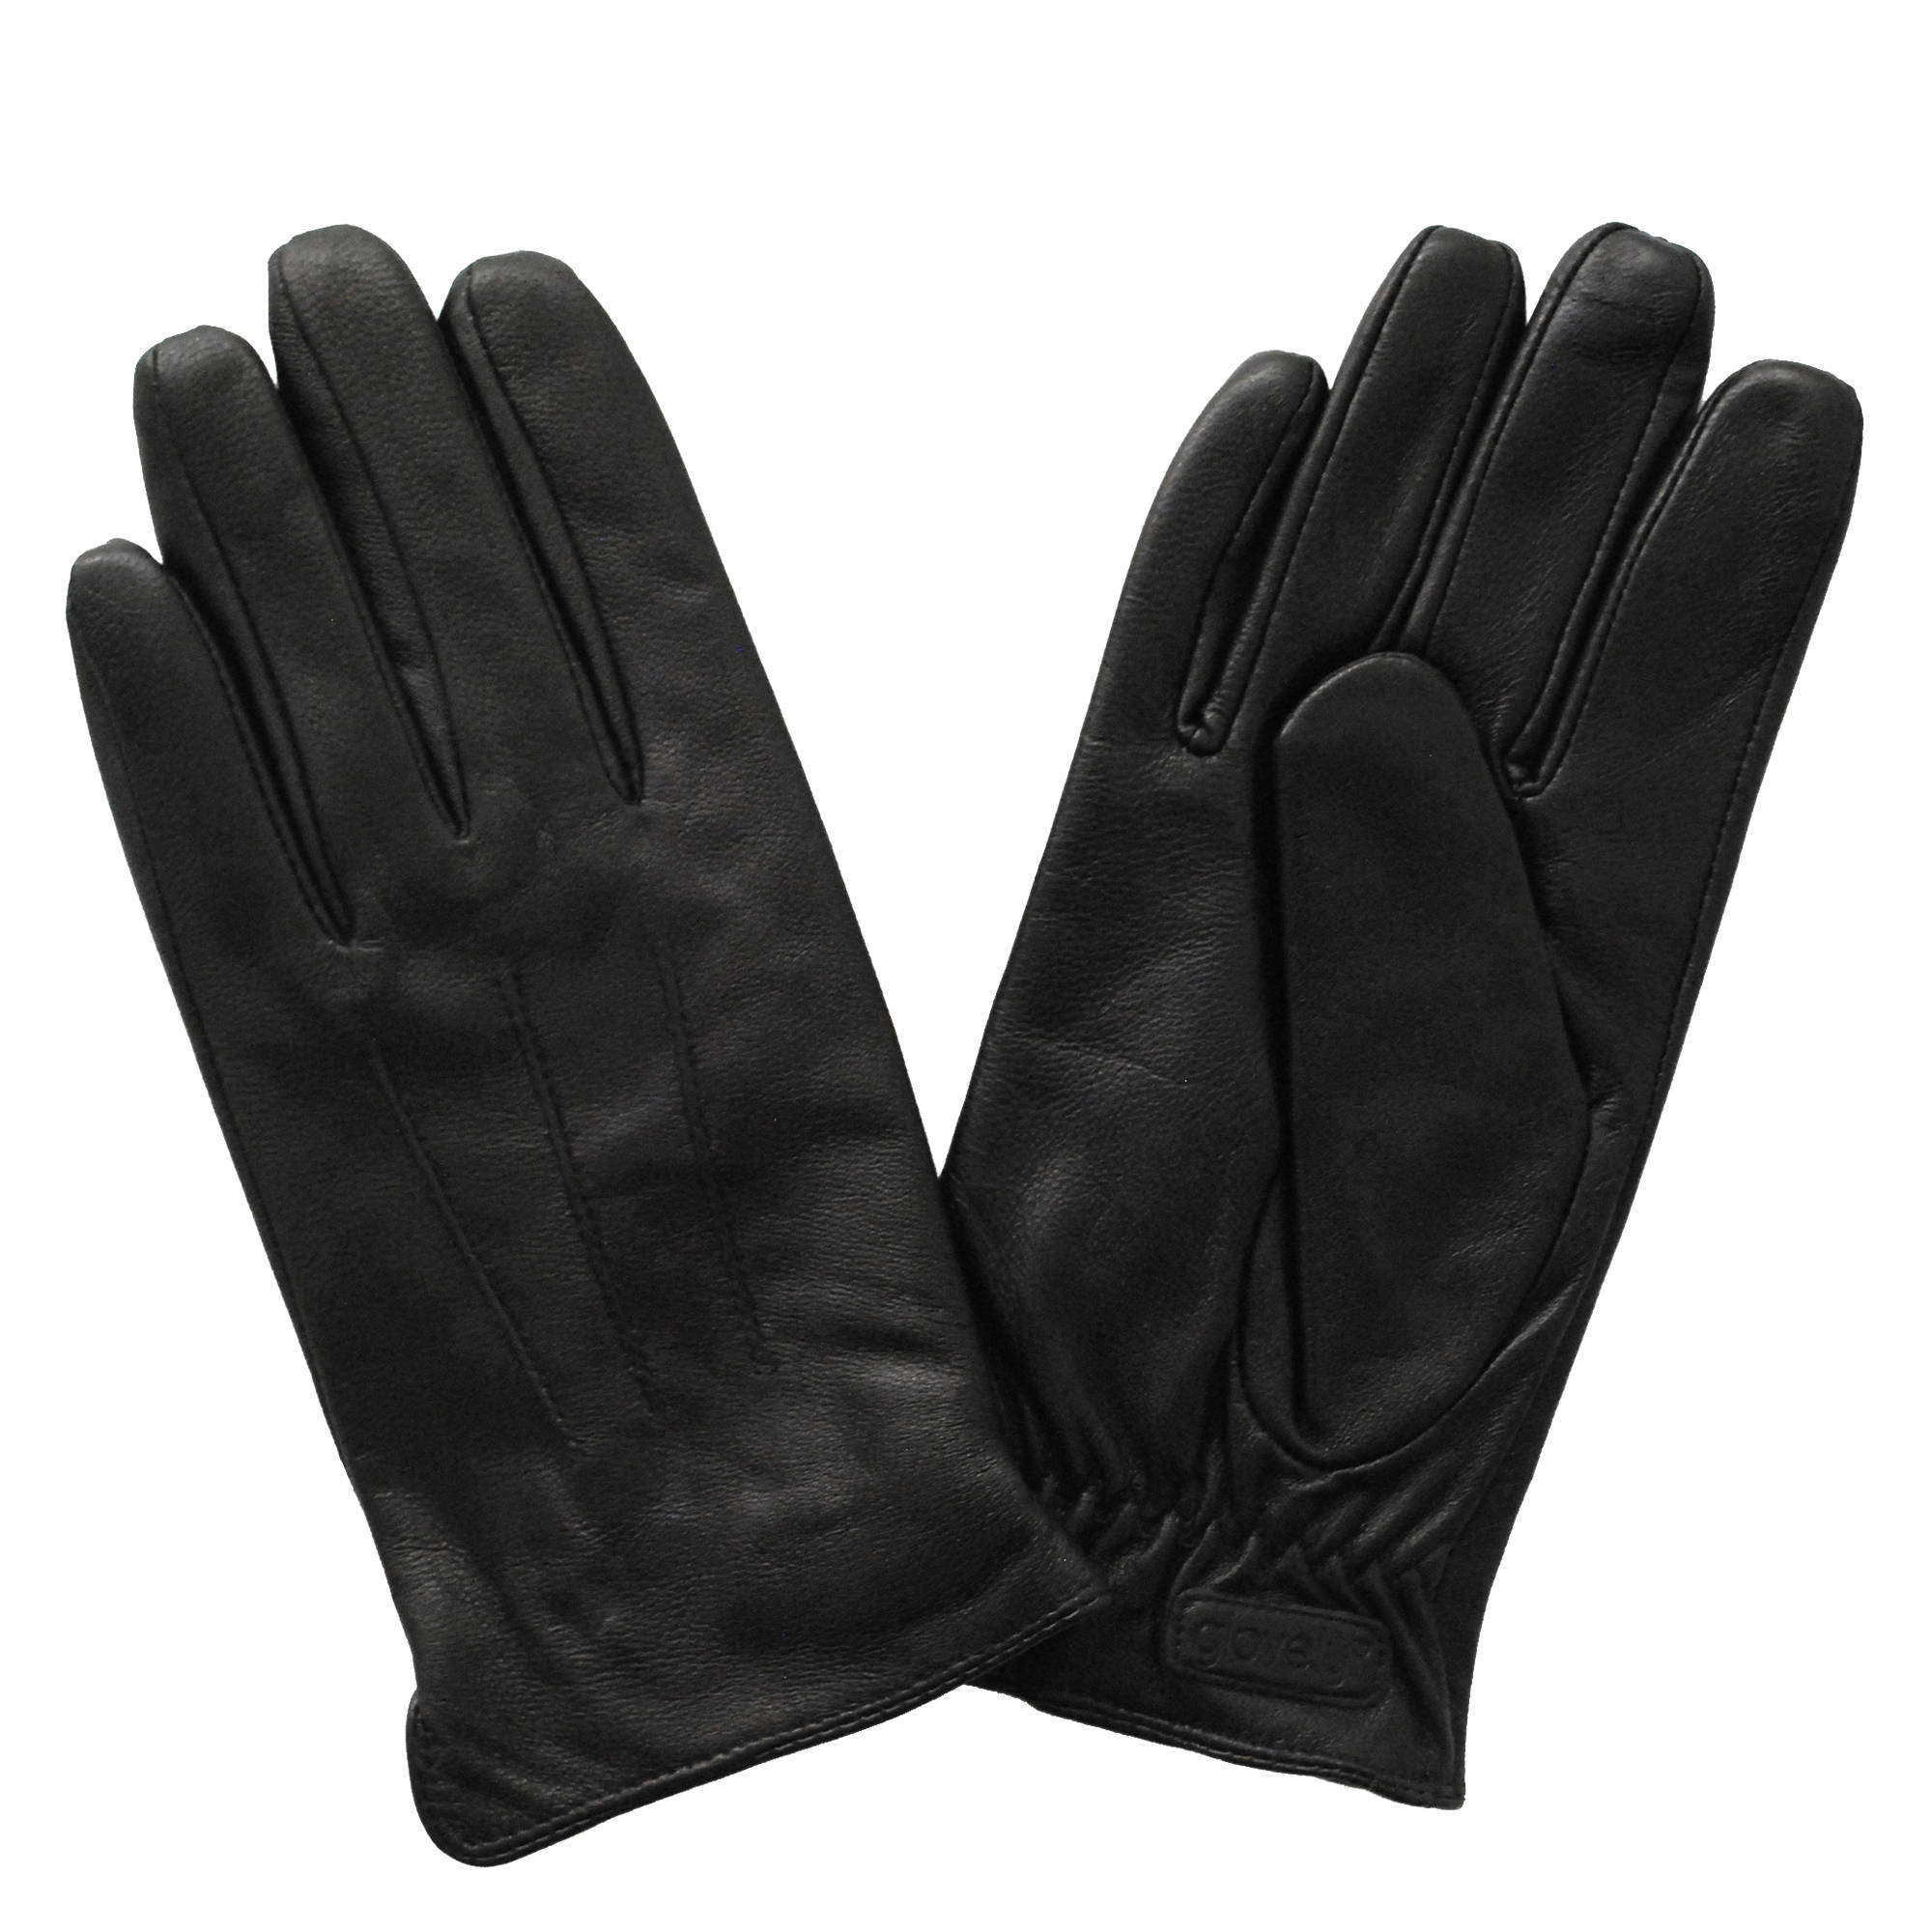 Black leather gloves small - Just Sheepskin Black Leather Gloves